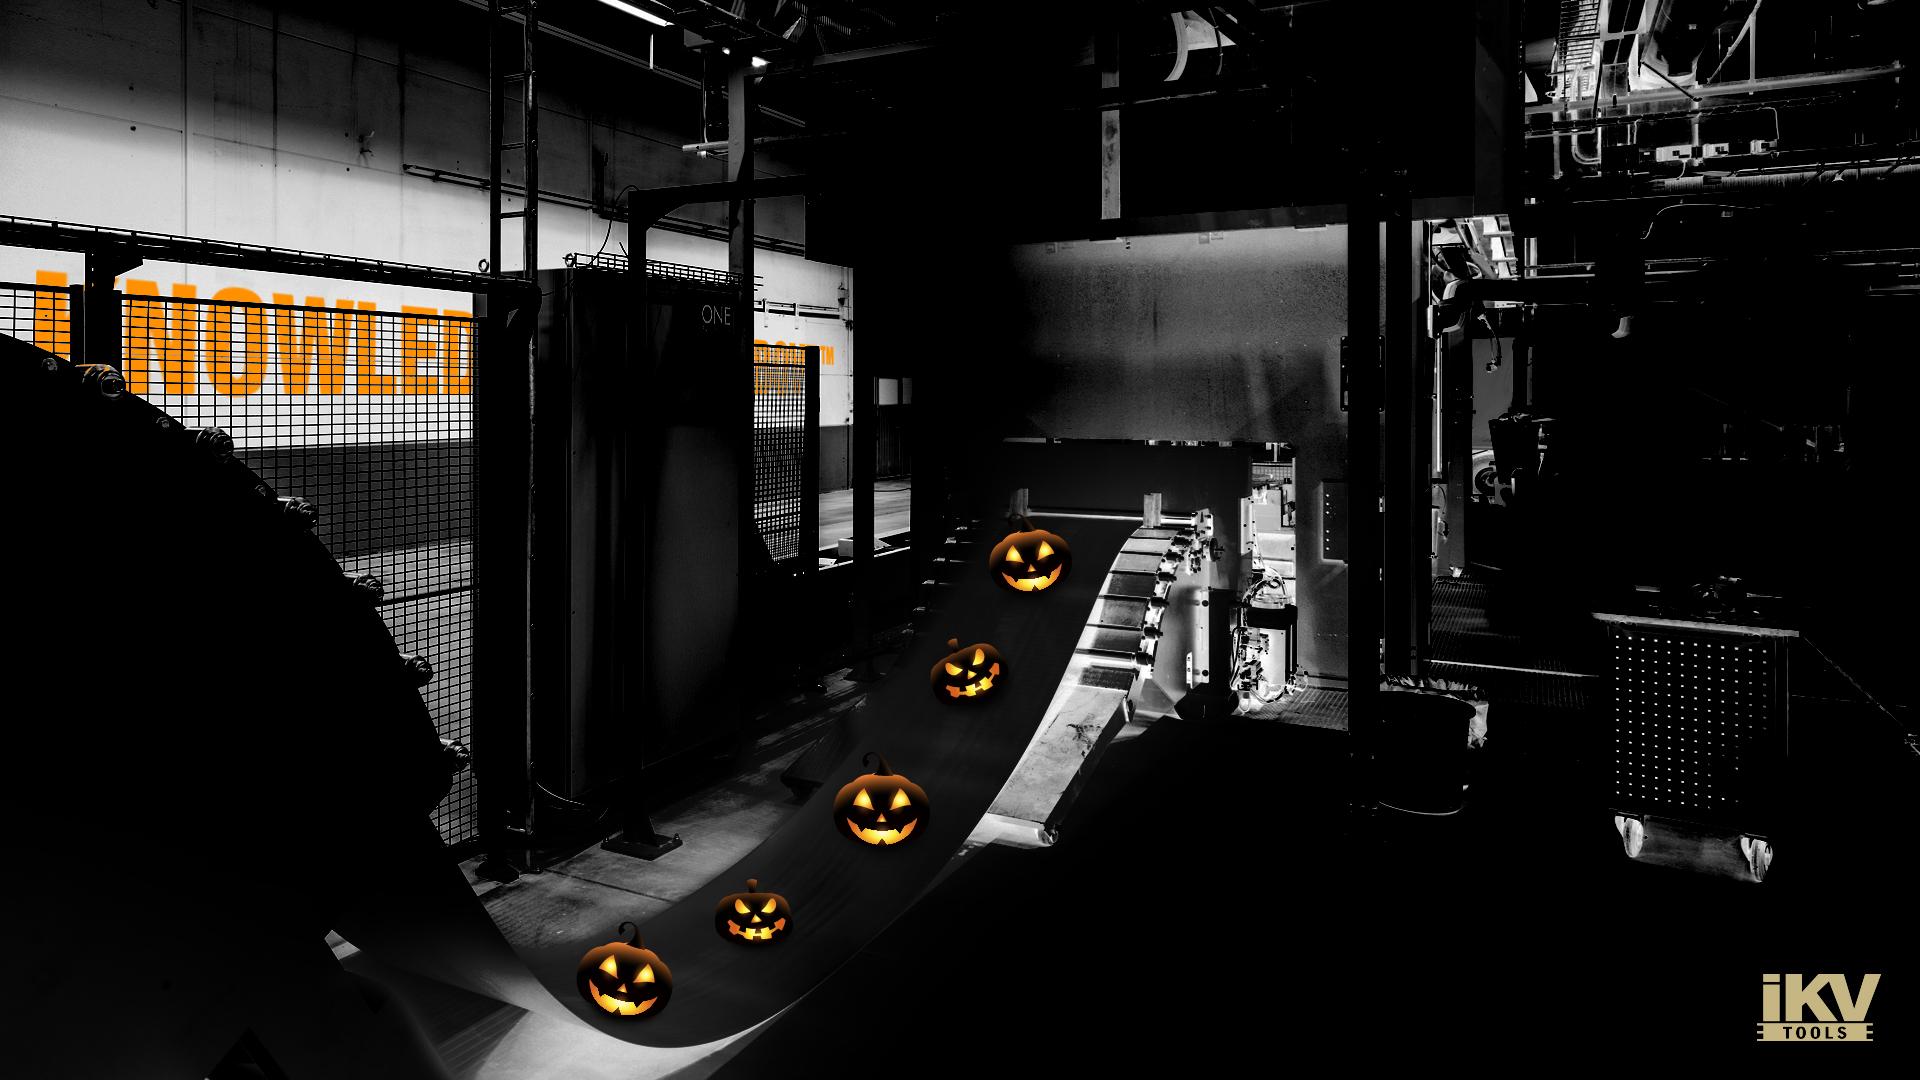 inlagg_halloween2019.jpg